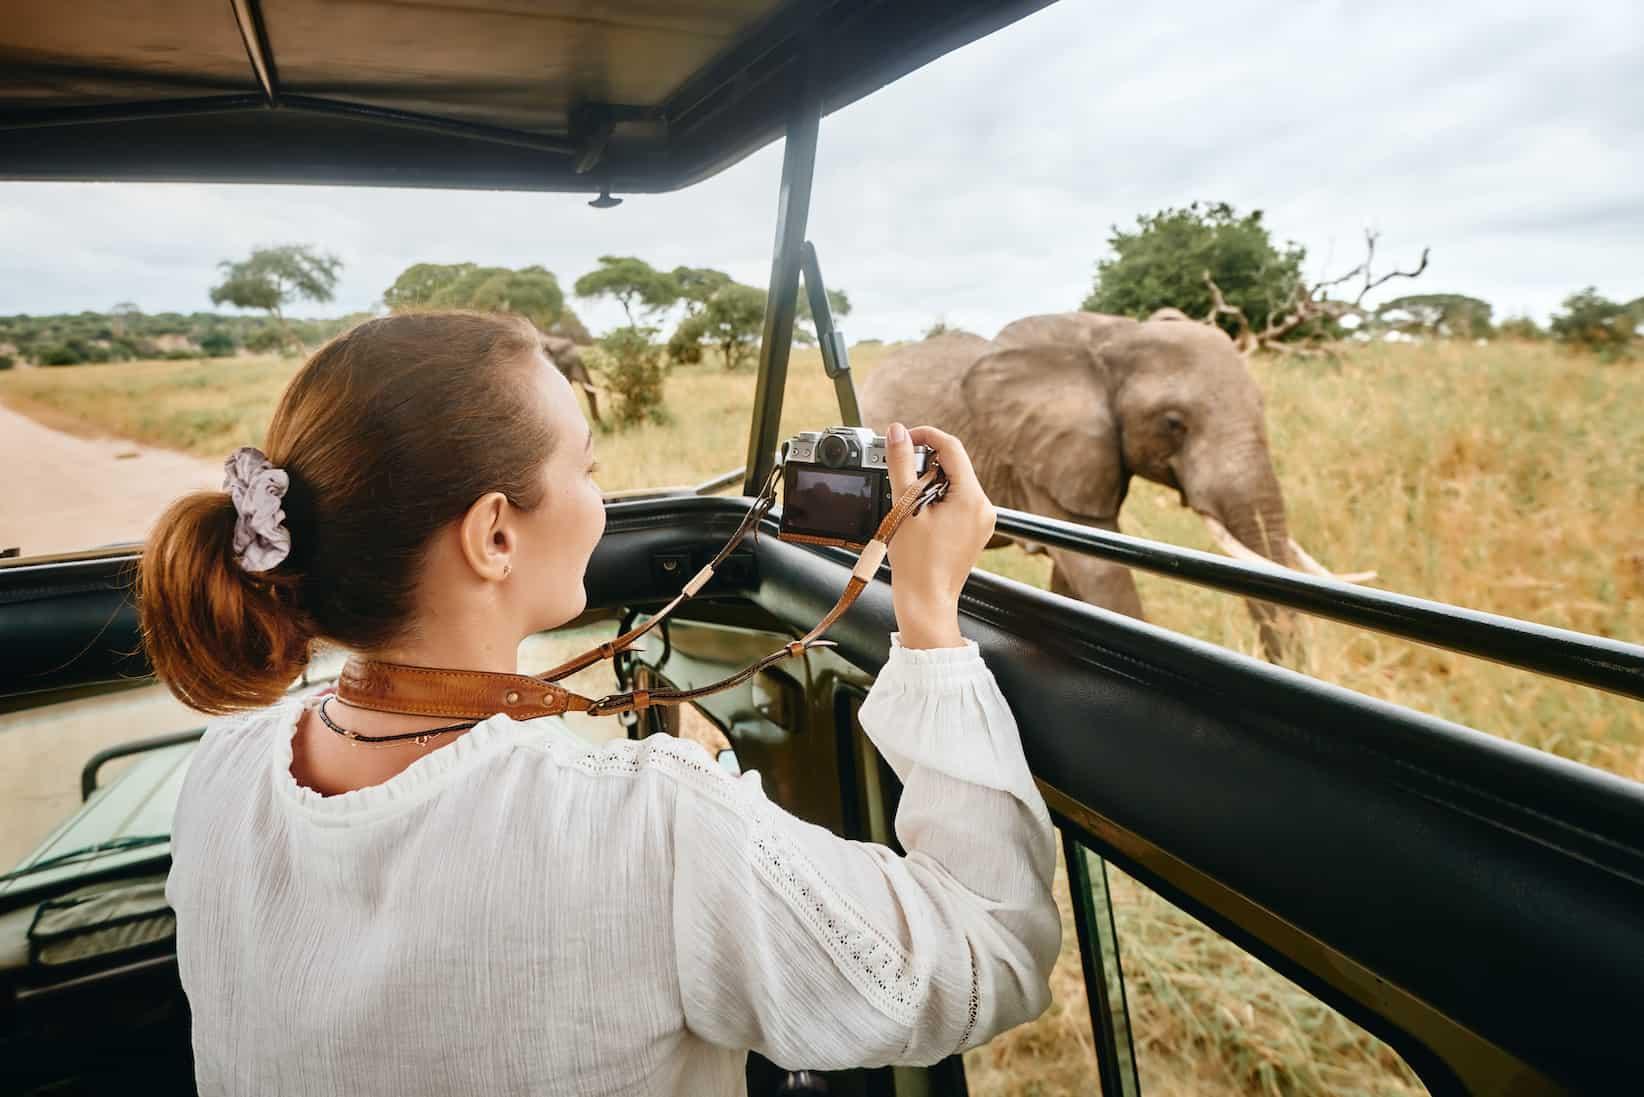 safari experience jackson african safari - picture